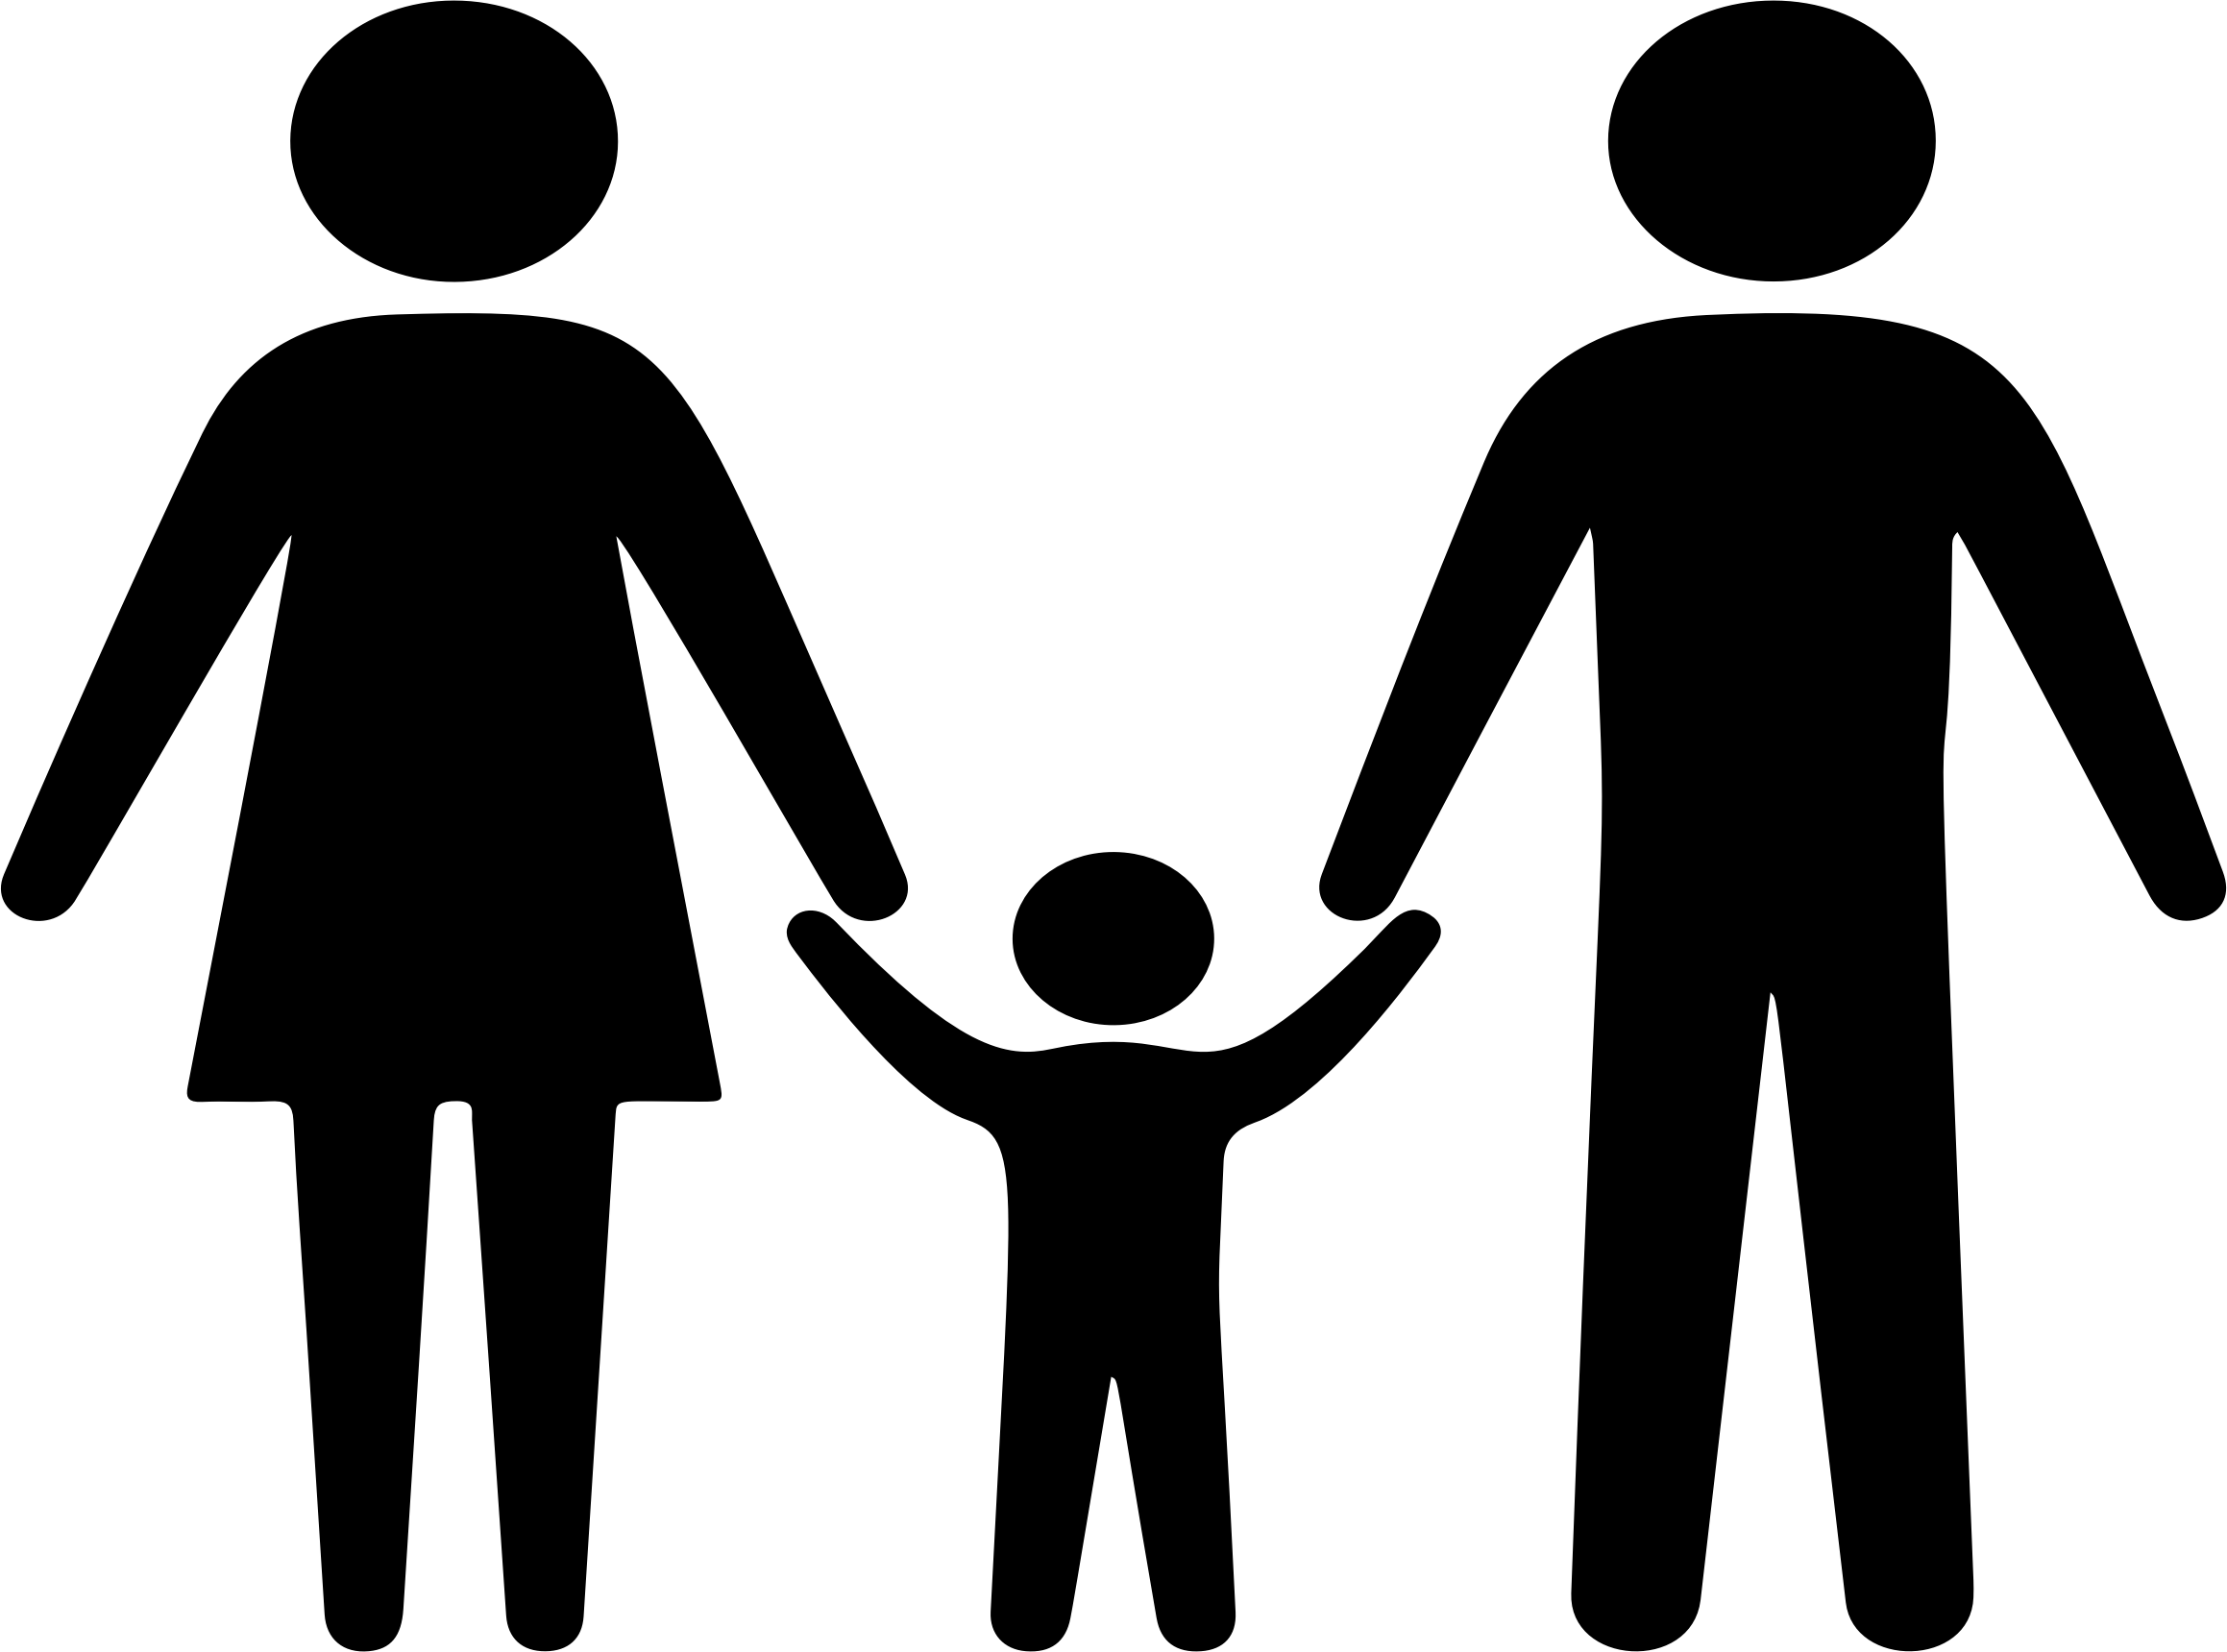 2318x1720 Clipart